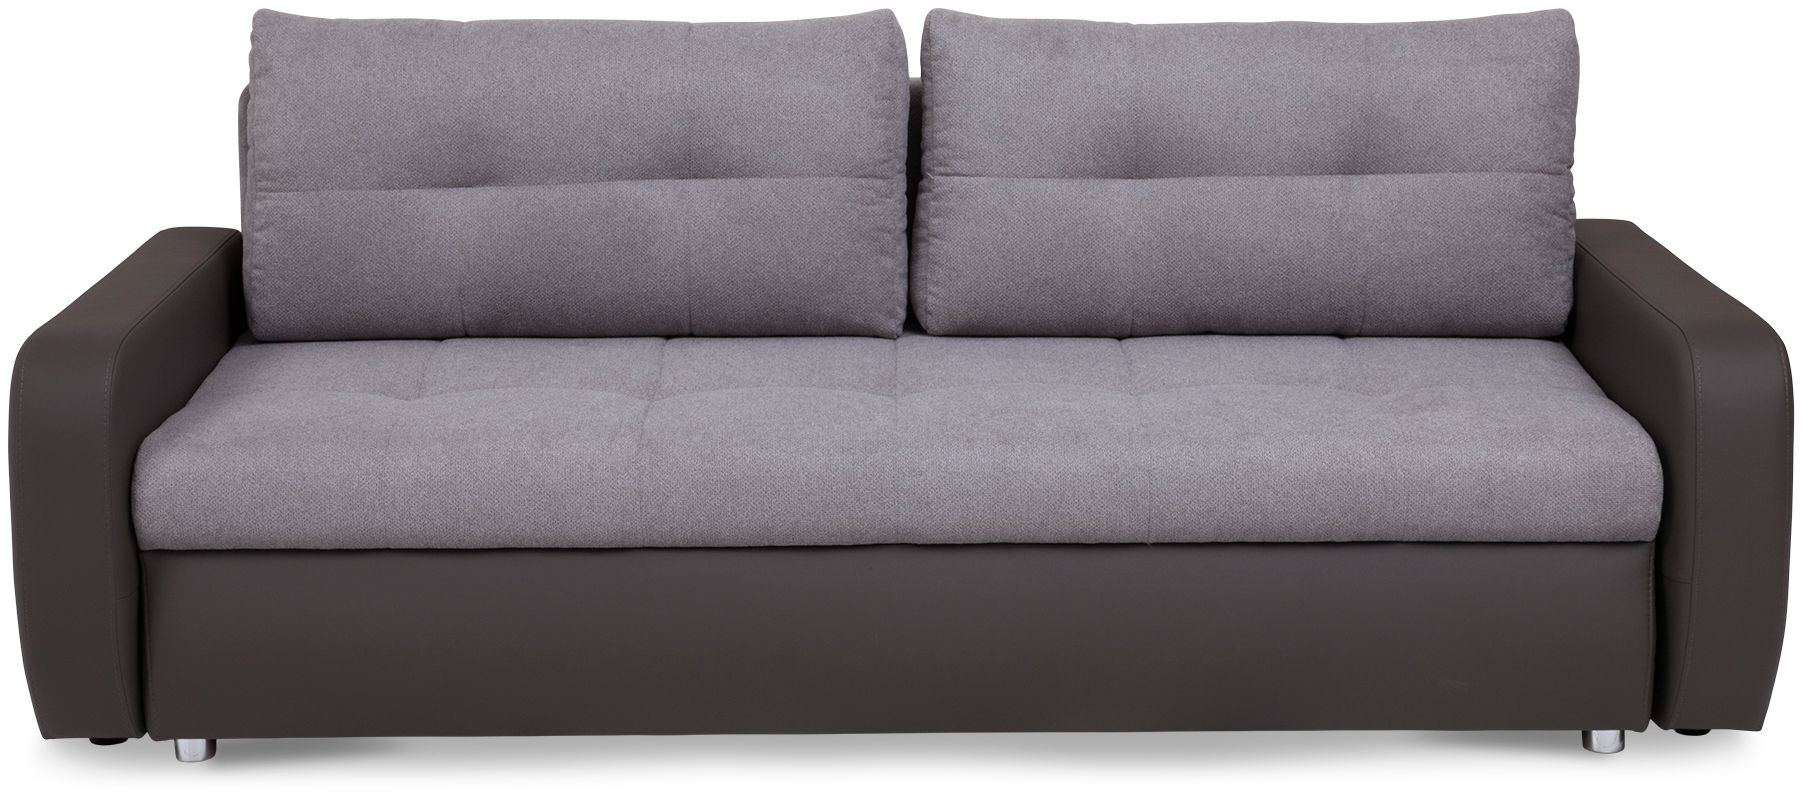 sofa aro 4